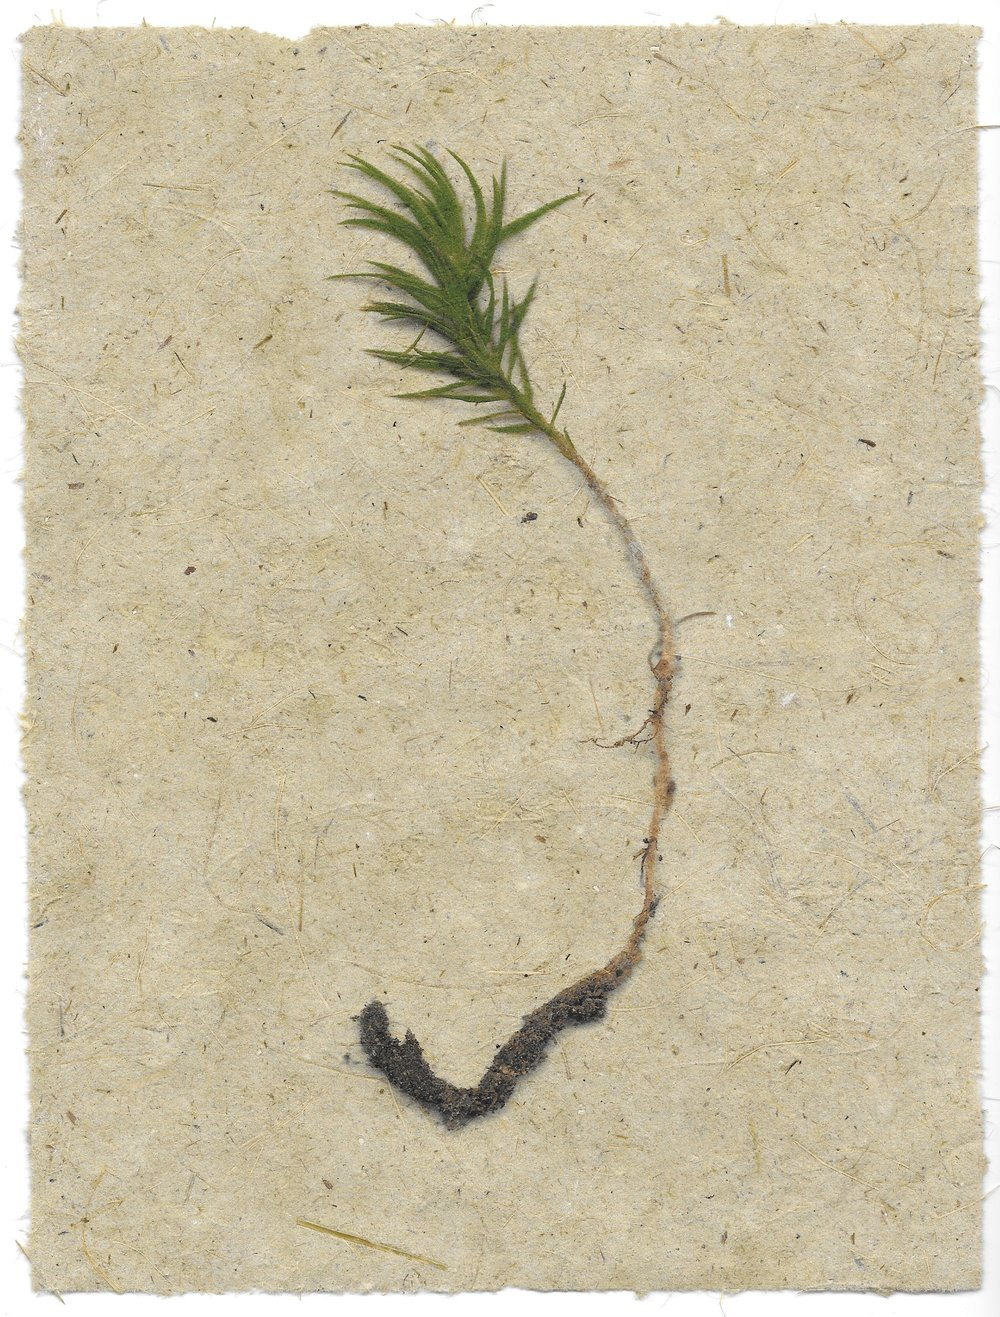 moss specimen #3